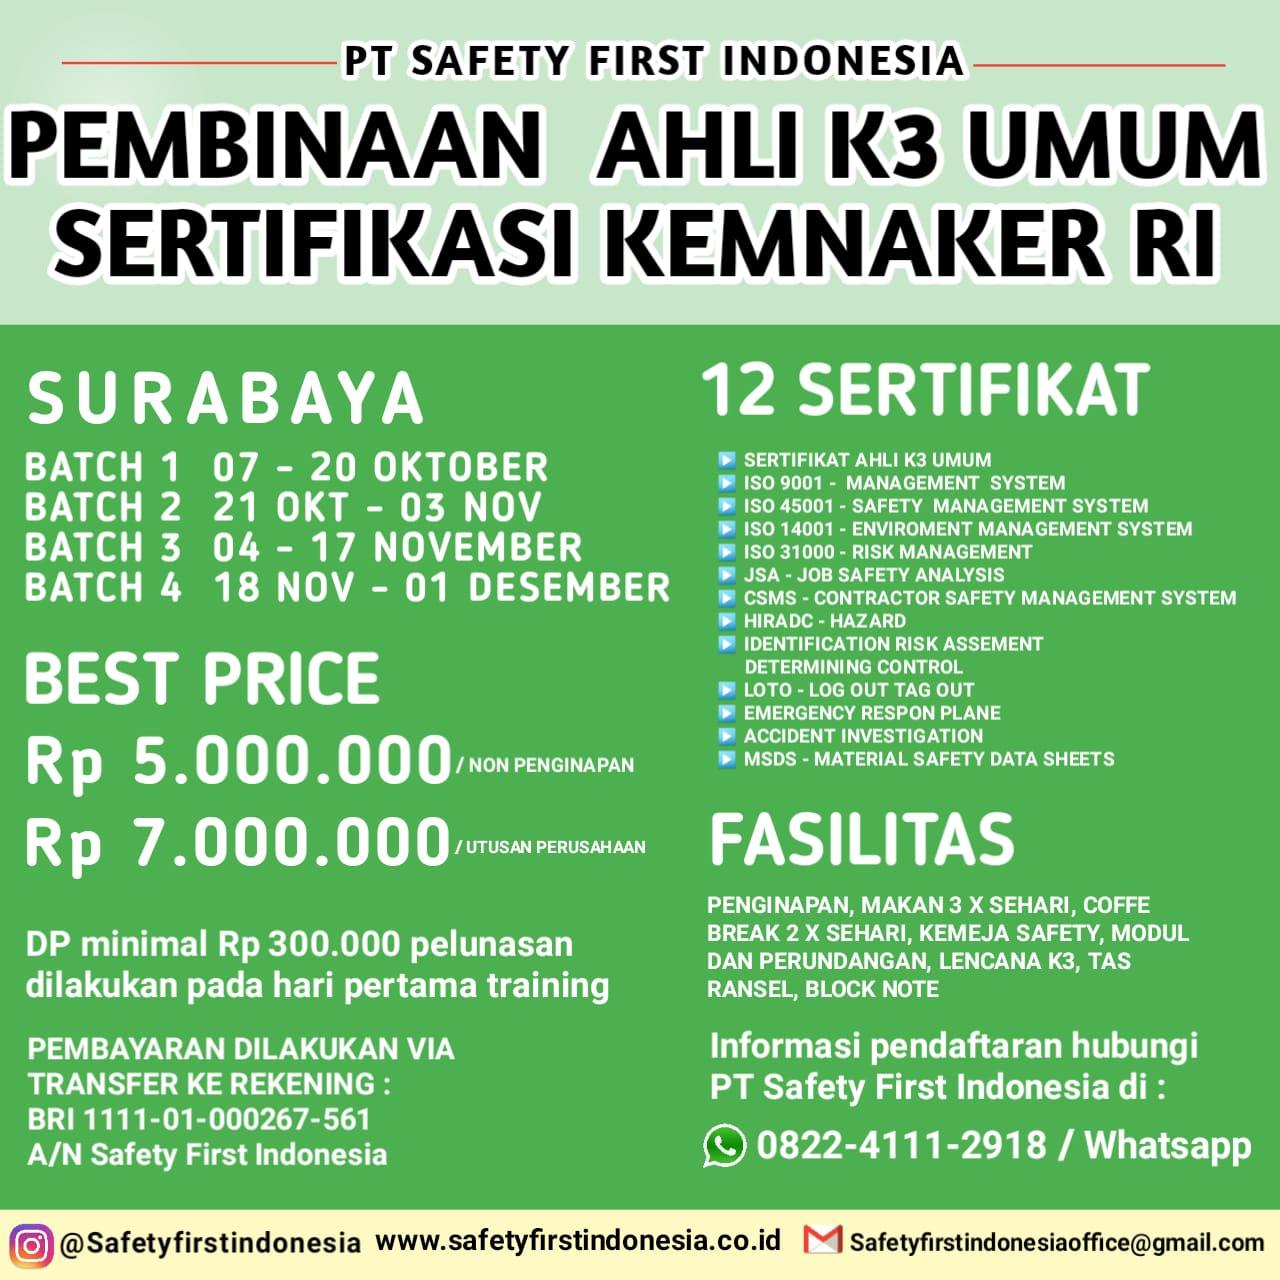 Pembinaan Ahli k3 Umum Surabaya